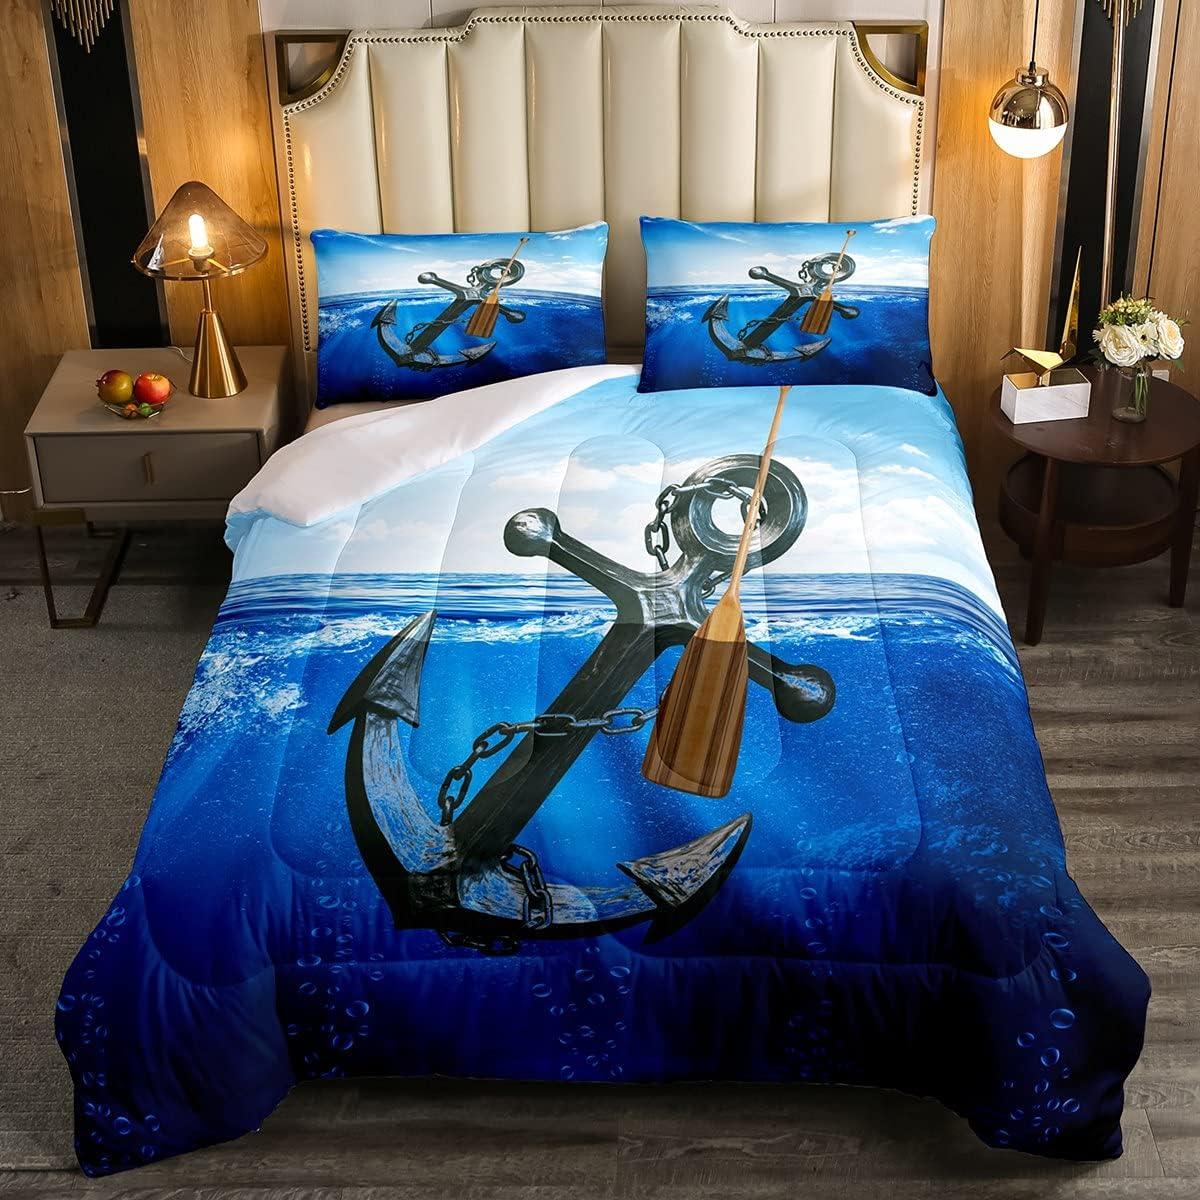 Feelyou Ocean Anchor Comforter Kids 35% OFF Nautical Theme Seattle Mall Marine Beddin